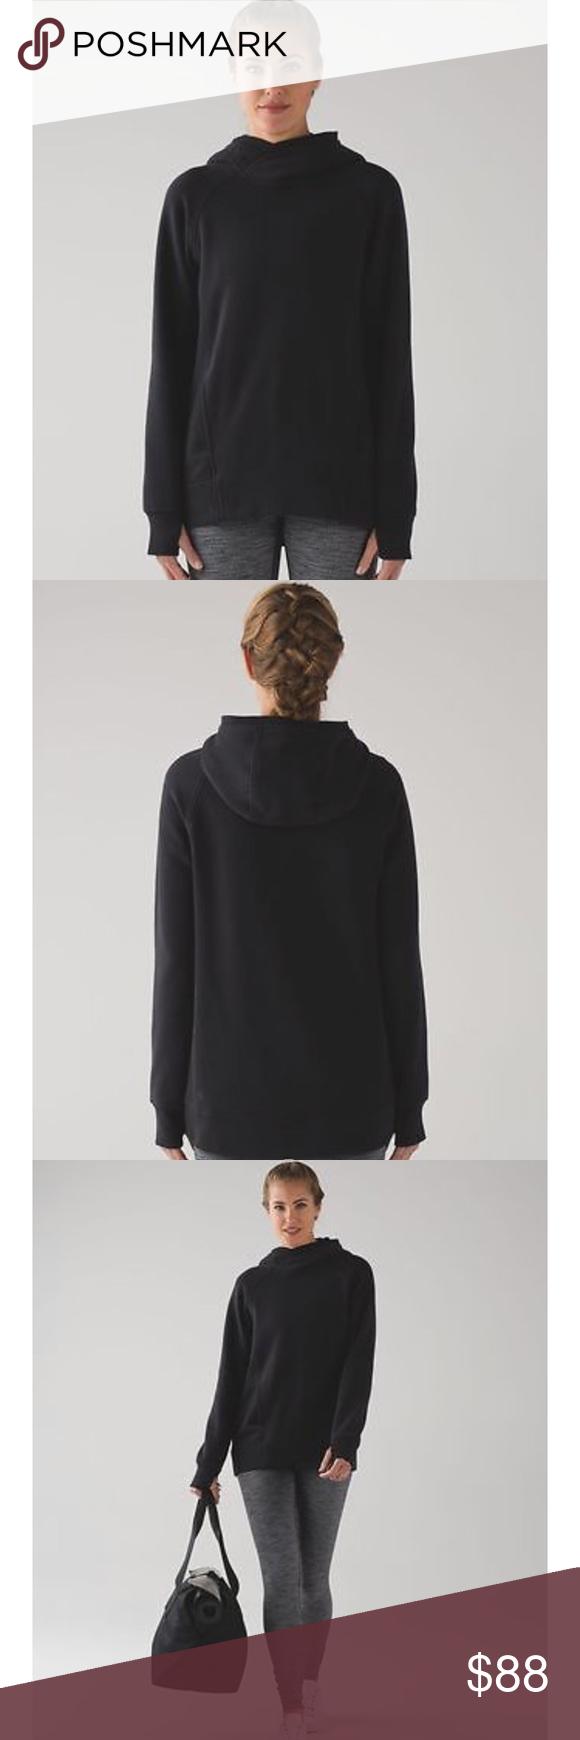 Lululemon Fleece Please Pullover | Tops, Sweatshirts & hoodies and ...